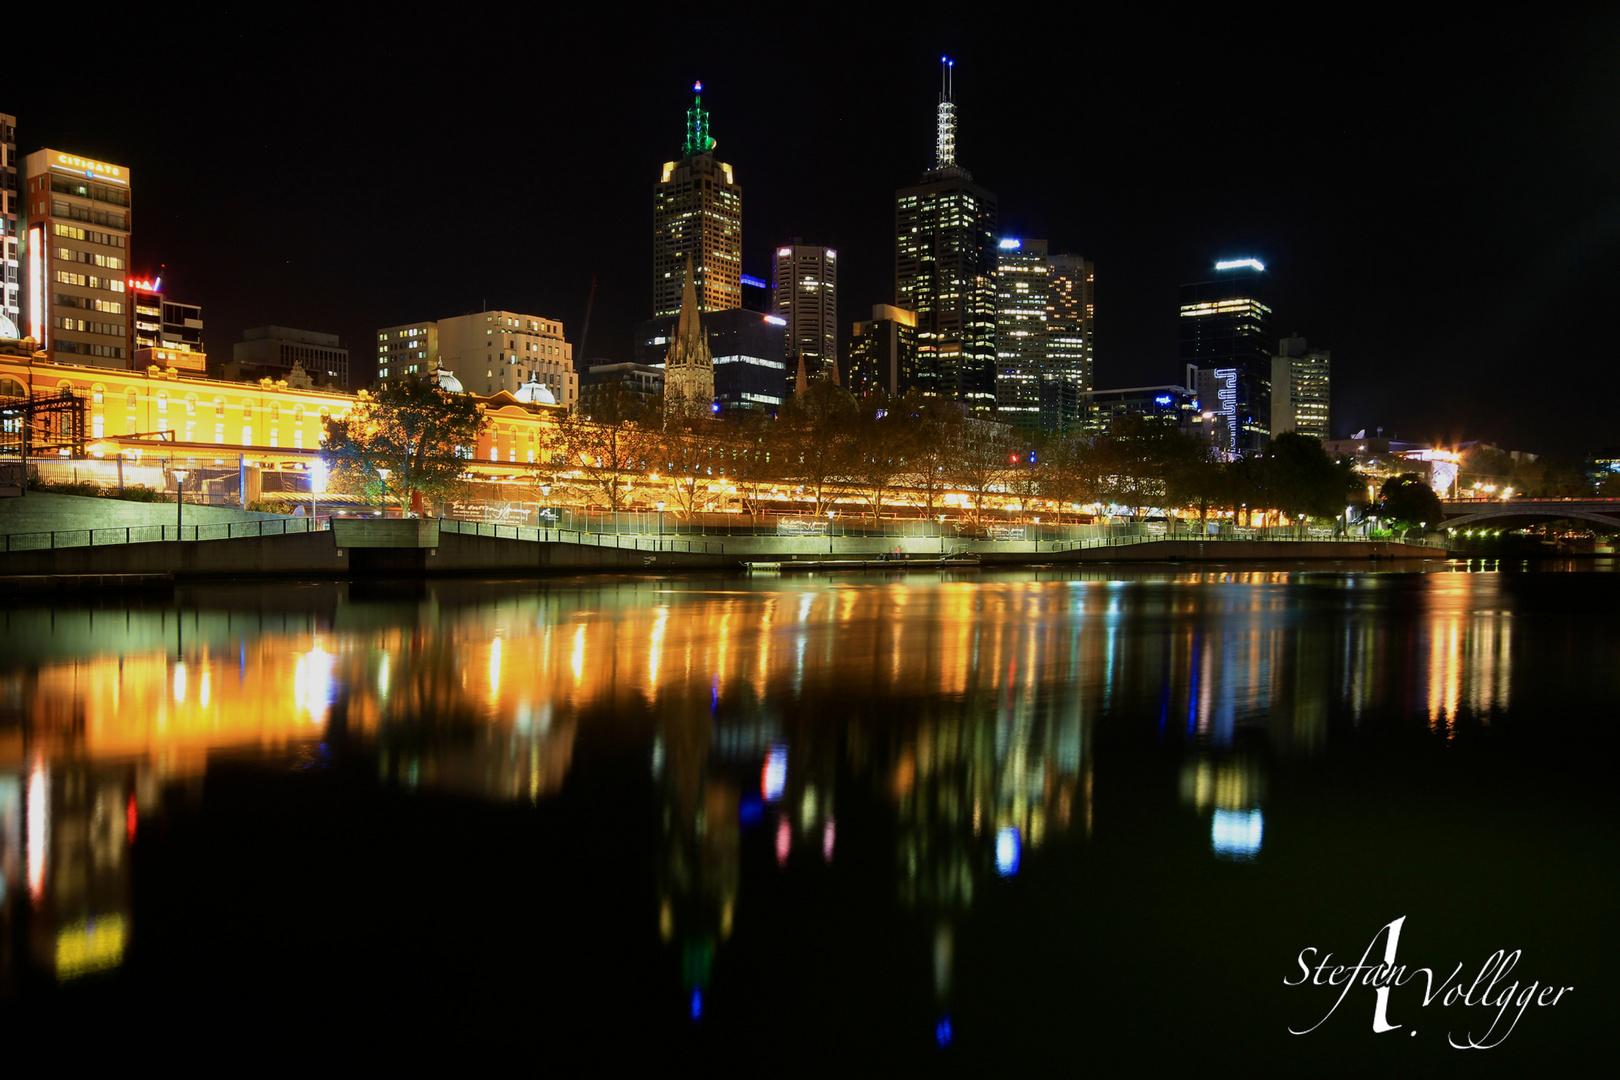 Reflections (Melbourne, CBD)